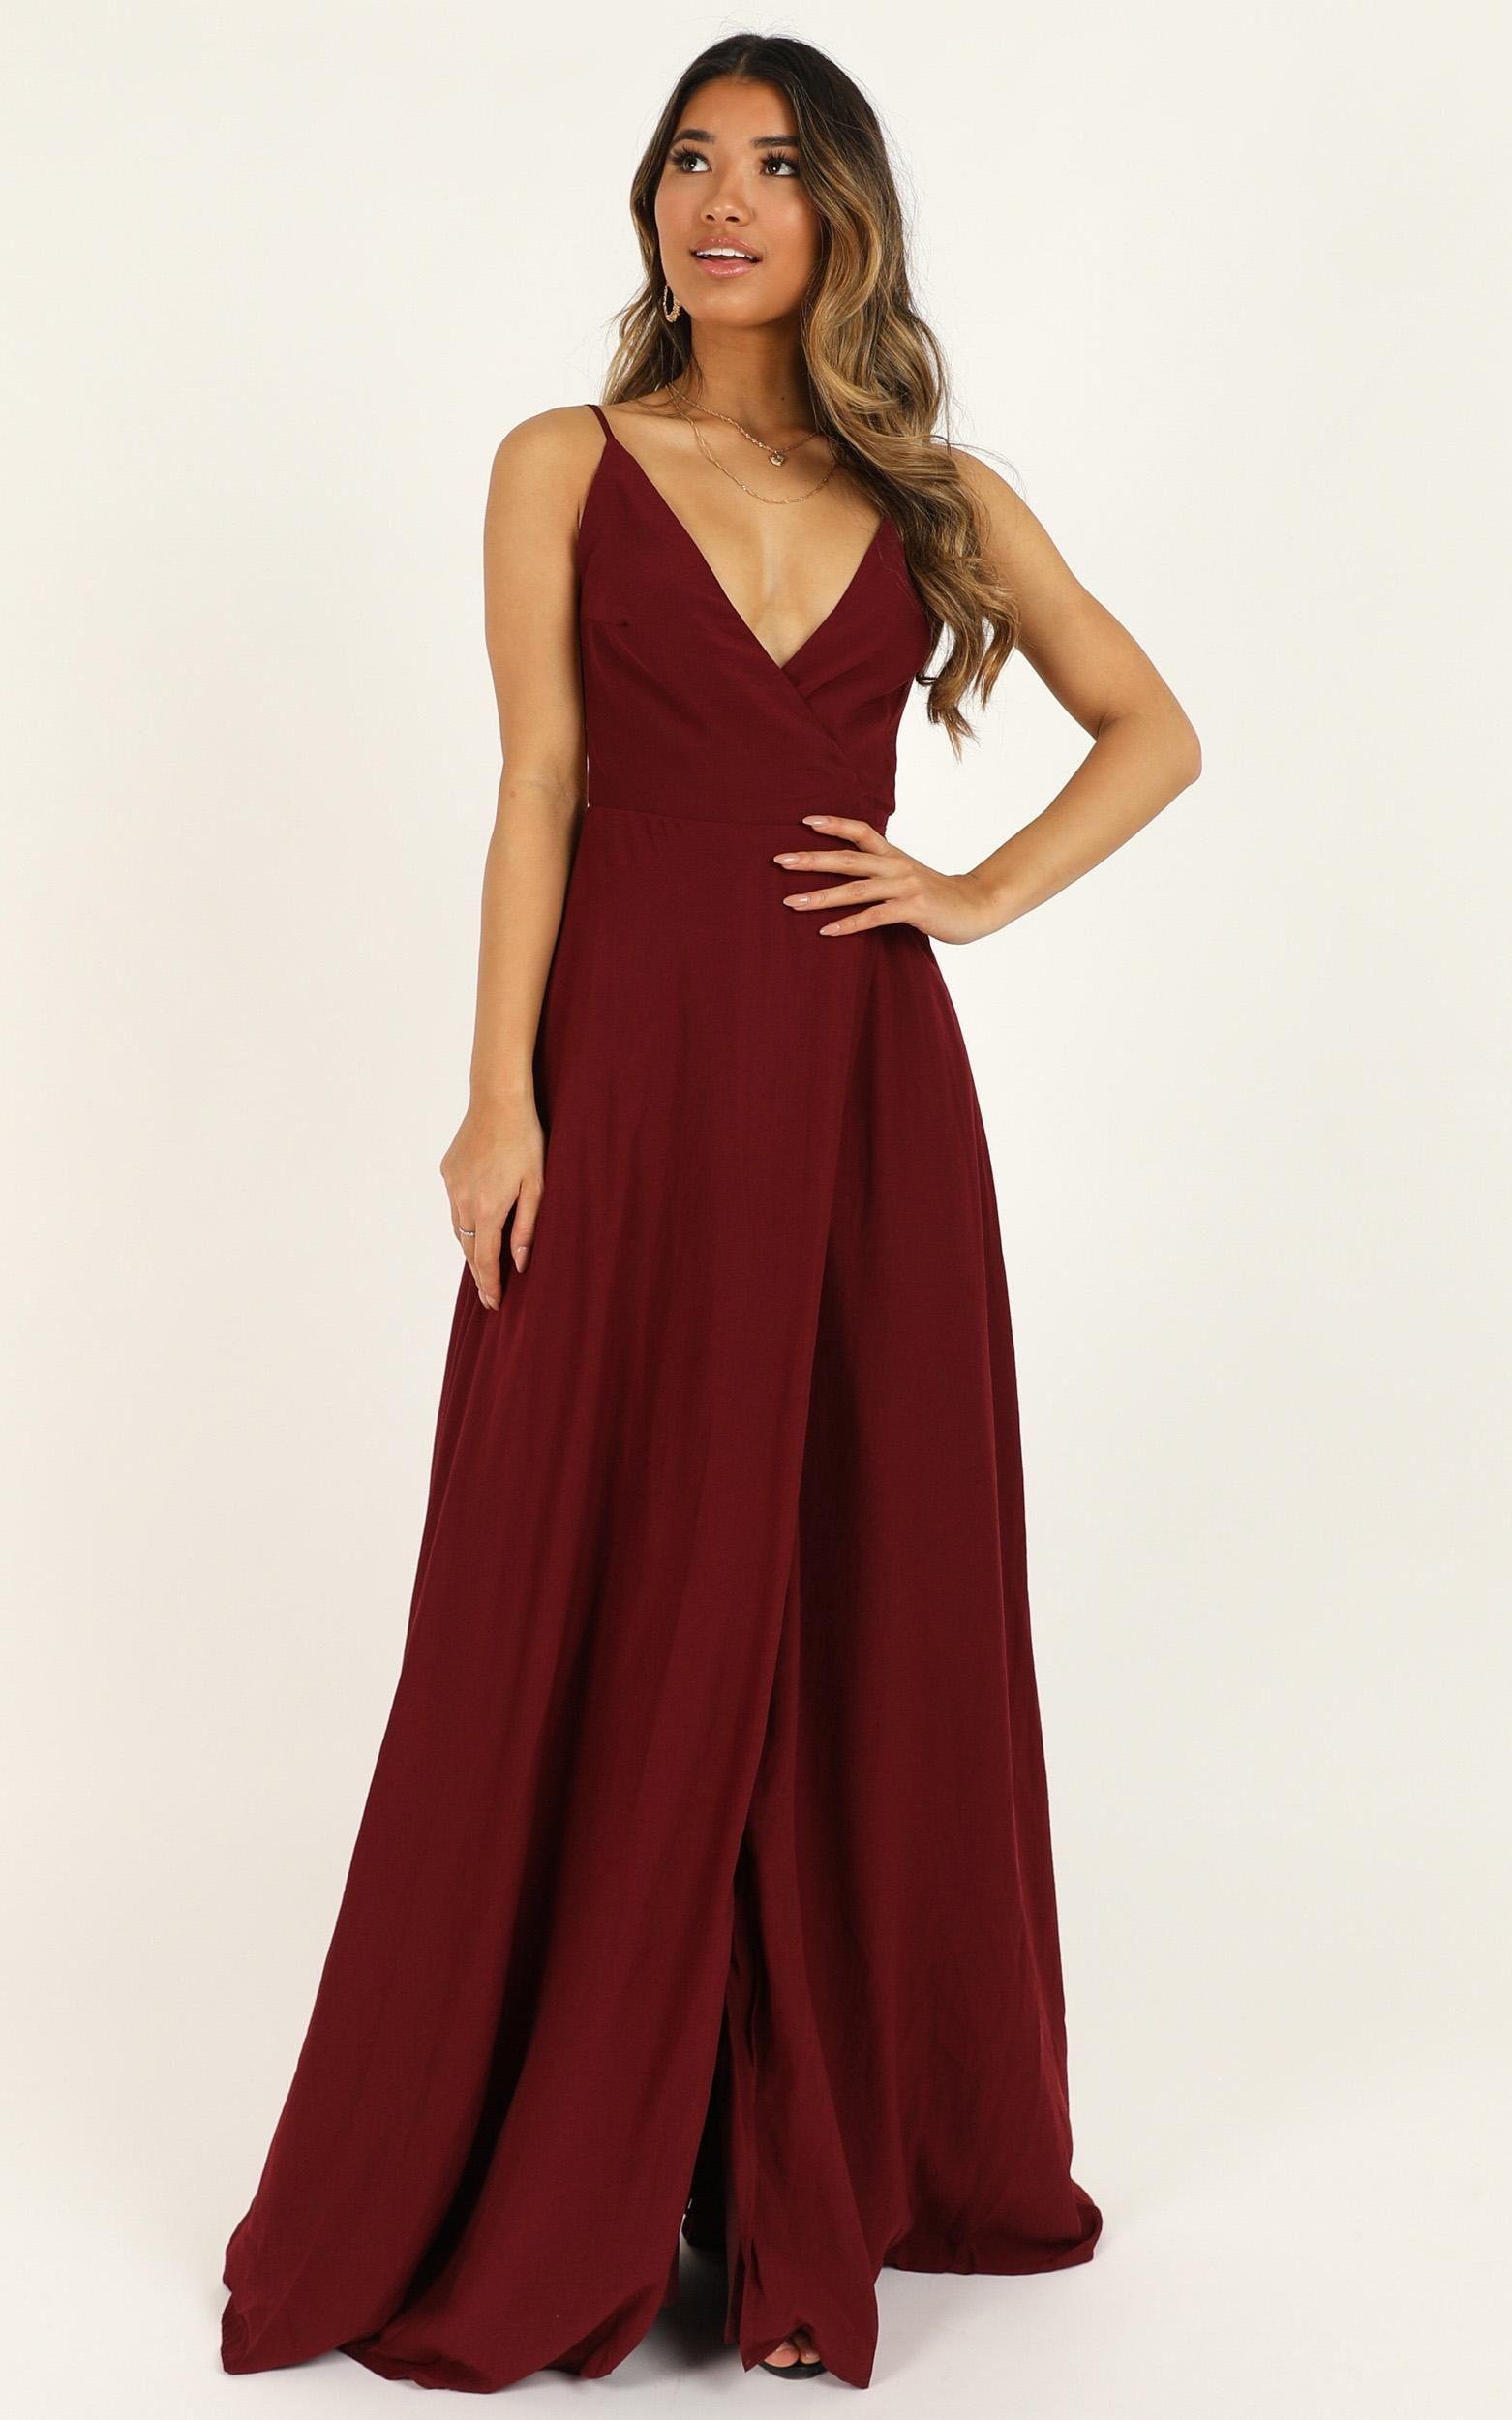 Starry Eyes Sparkling Dress In Wine Satin Showpo Maroon Bridesmaid Dresses Dresses Red Bridesmaid Dresses [ 2500 x 1562 Pixel ]